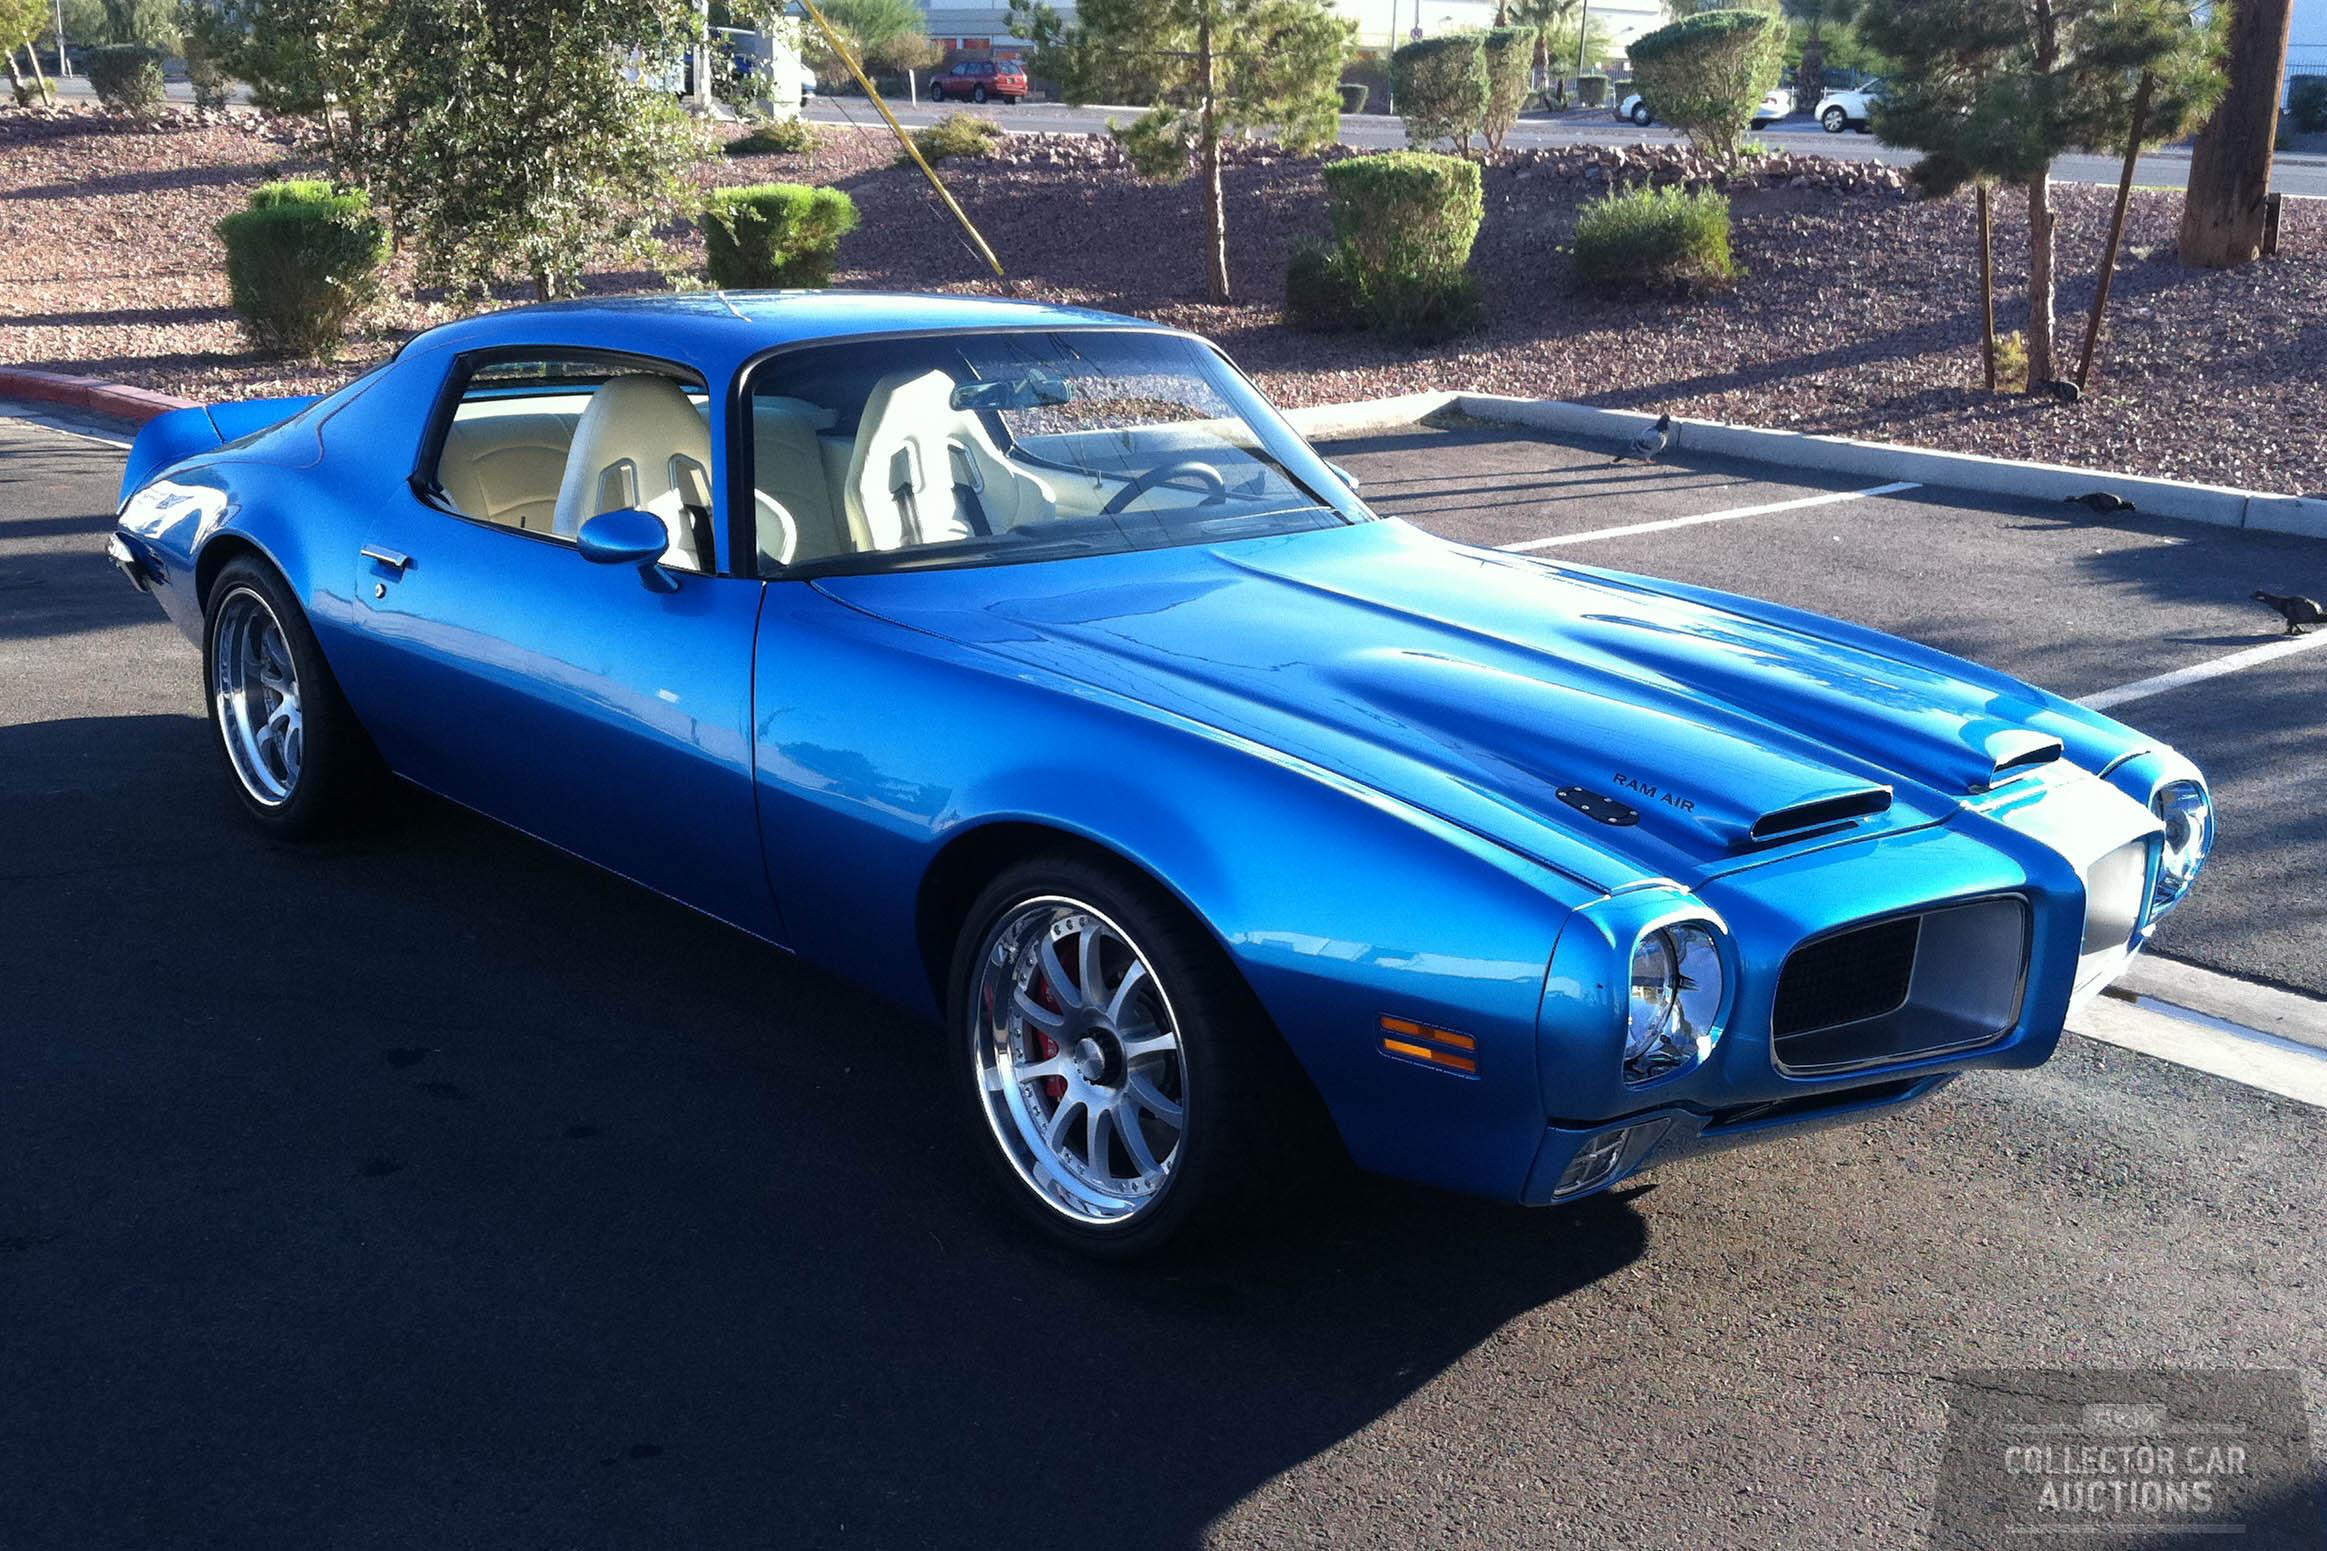 1970 pontiac firebird formula 400 supercharged 418ci ls3 6 speed sema muscle cars hot rod w. Black Bedroom Furniture Sets. Home Design Ideas